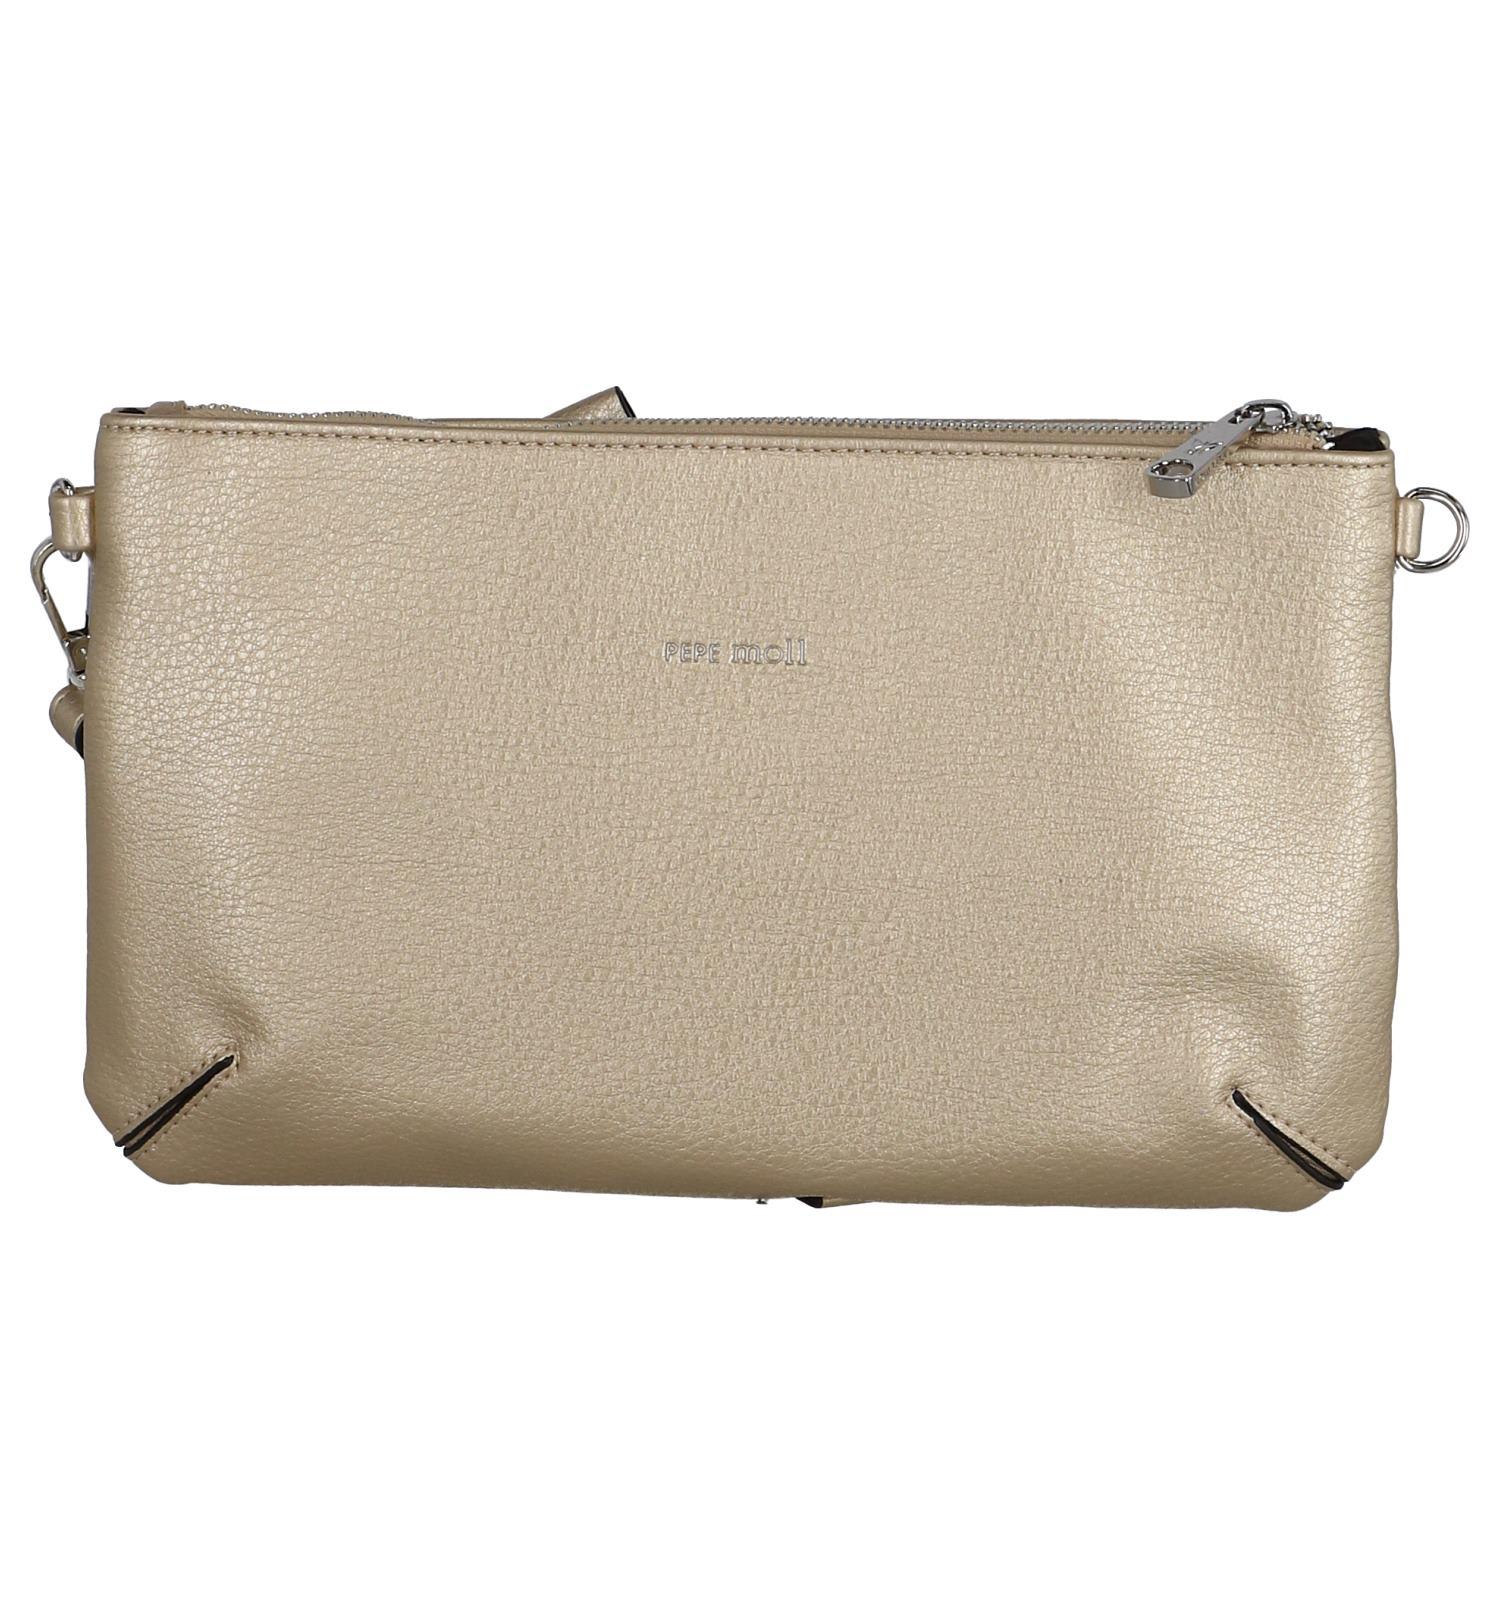 9c16bb1c60d Gouden Crossbody Tas Pepe Moll | TORFS.BE | Gratis verzend en retour